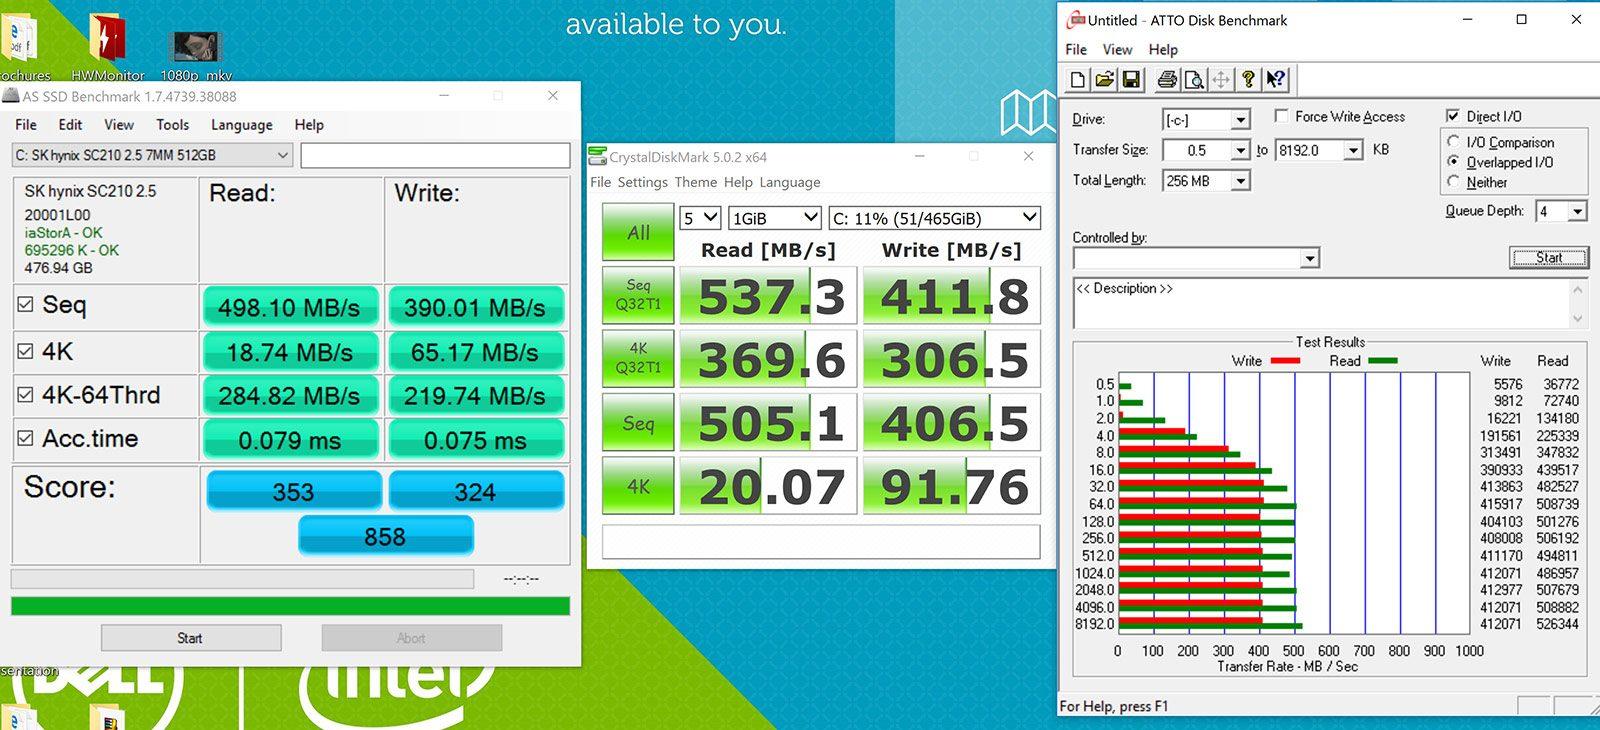 Dell Precision 5510 review – the portable workstation